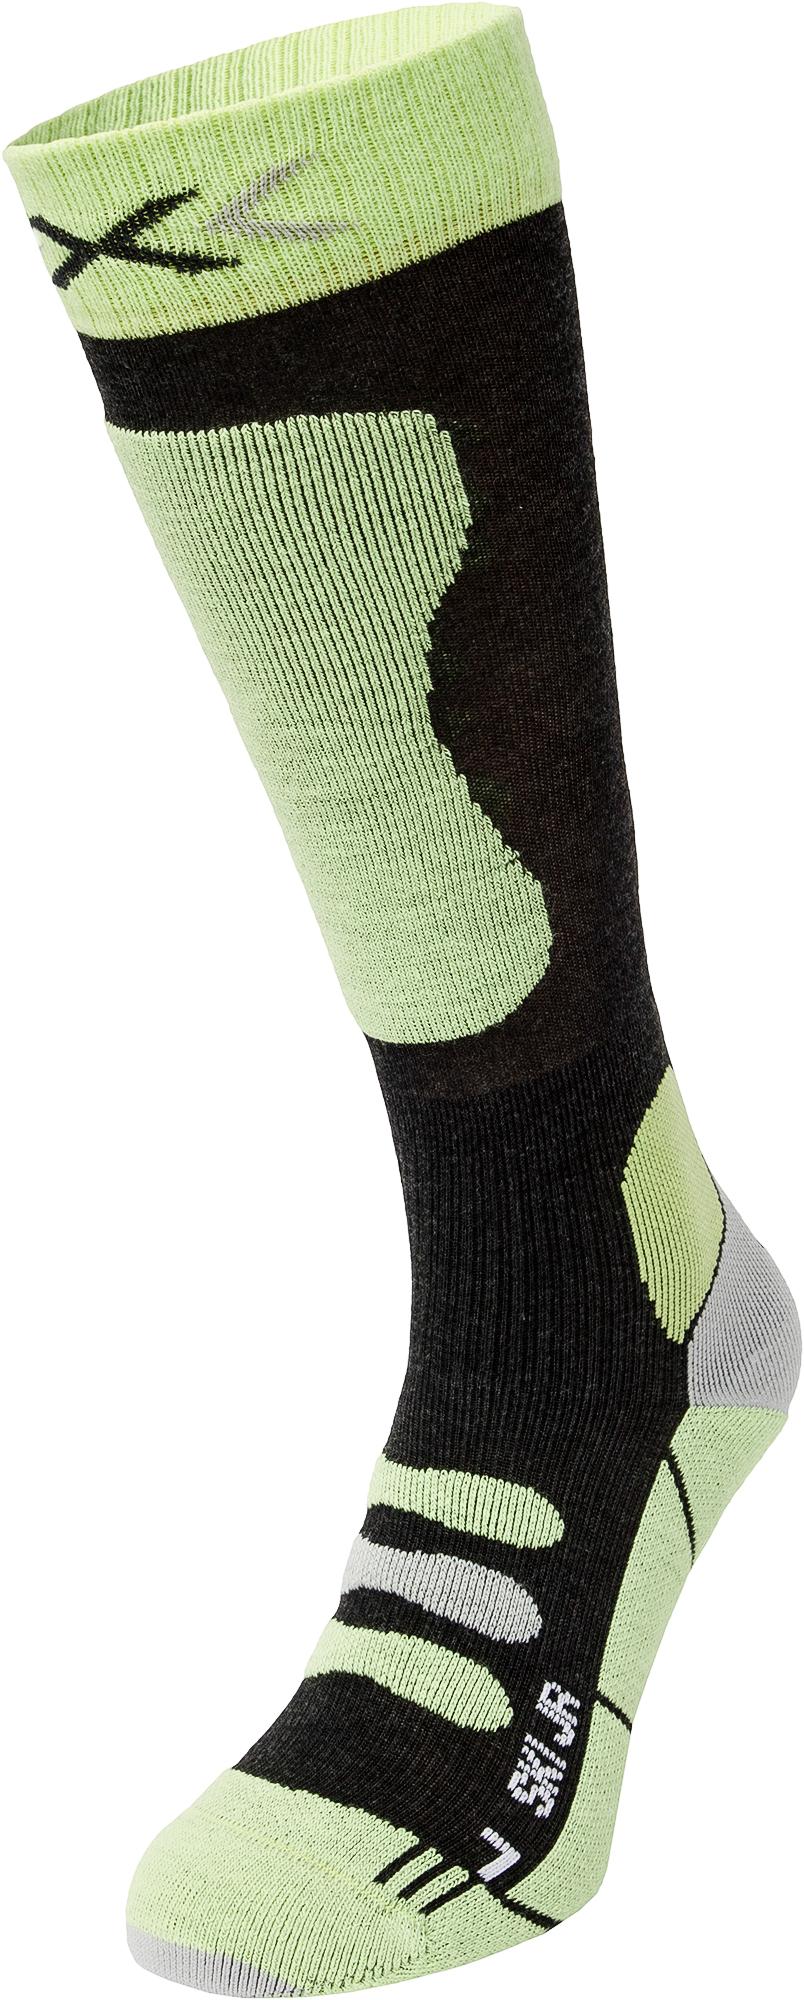 X-Socks Гольфы детские X-Socks SKI JR 4.0, 1 пара, размер 35-38